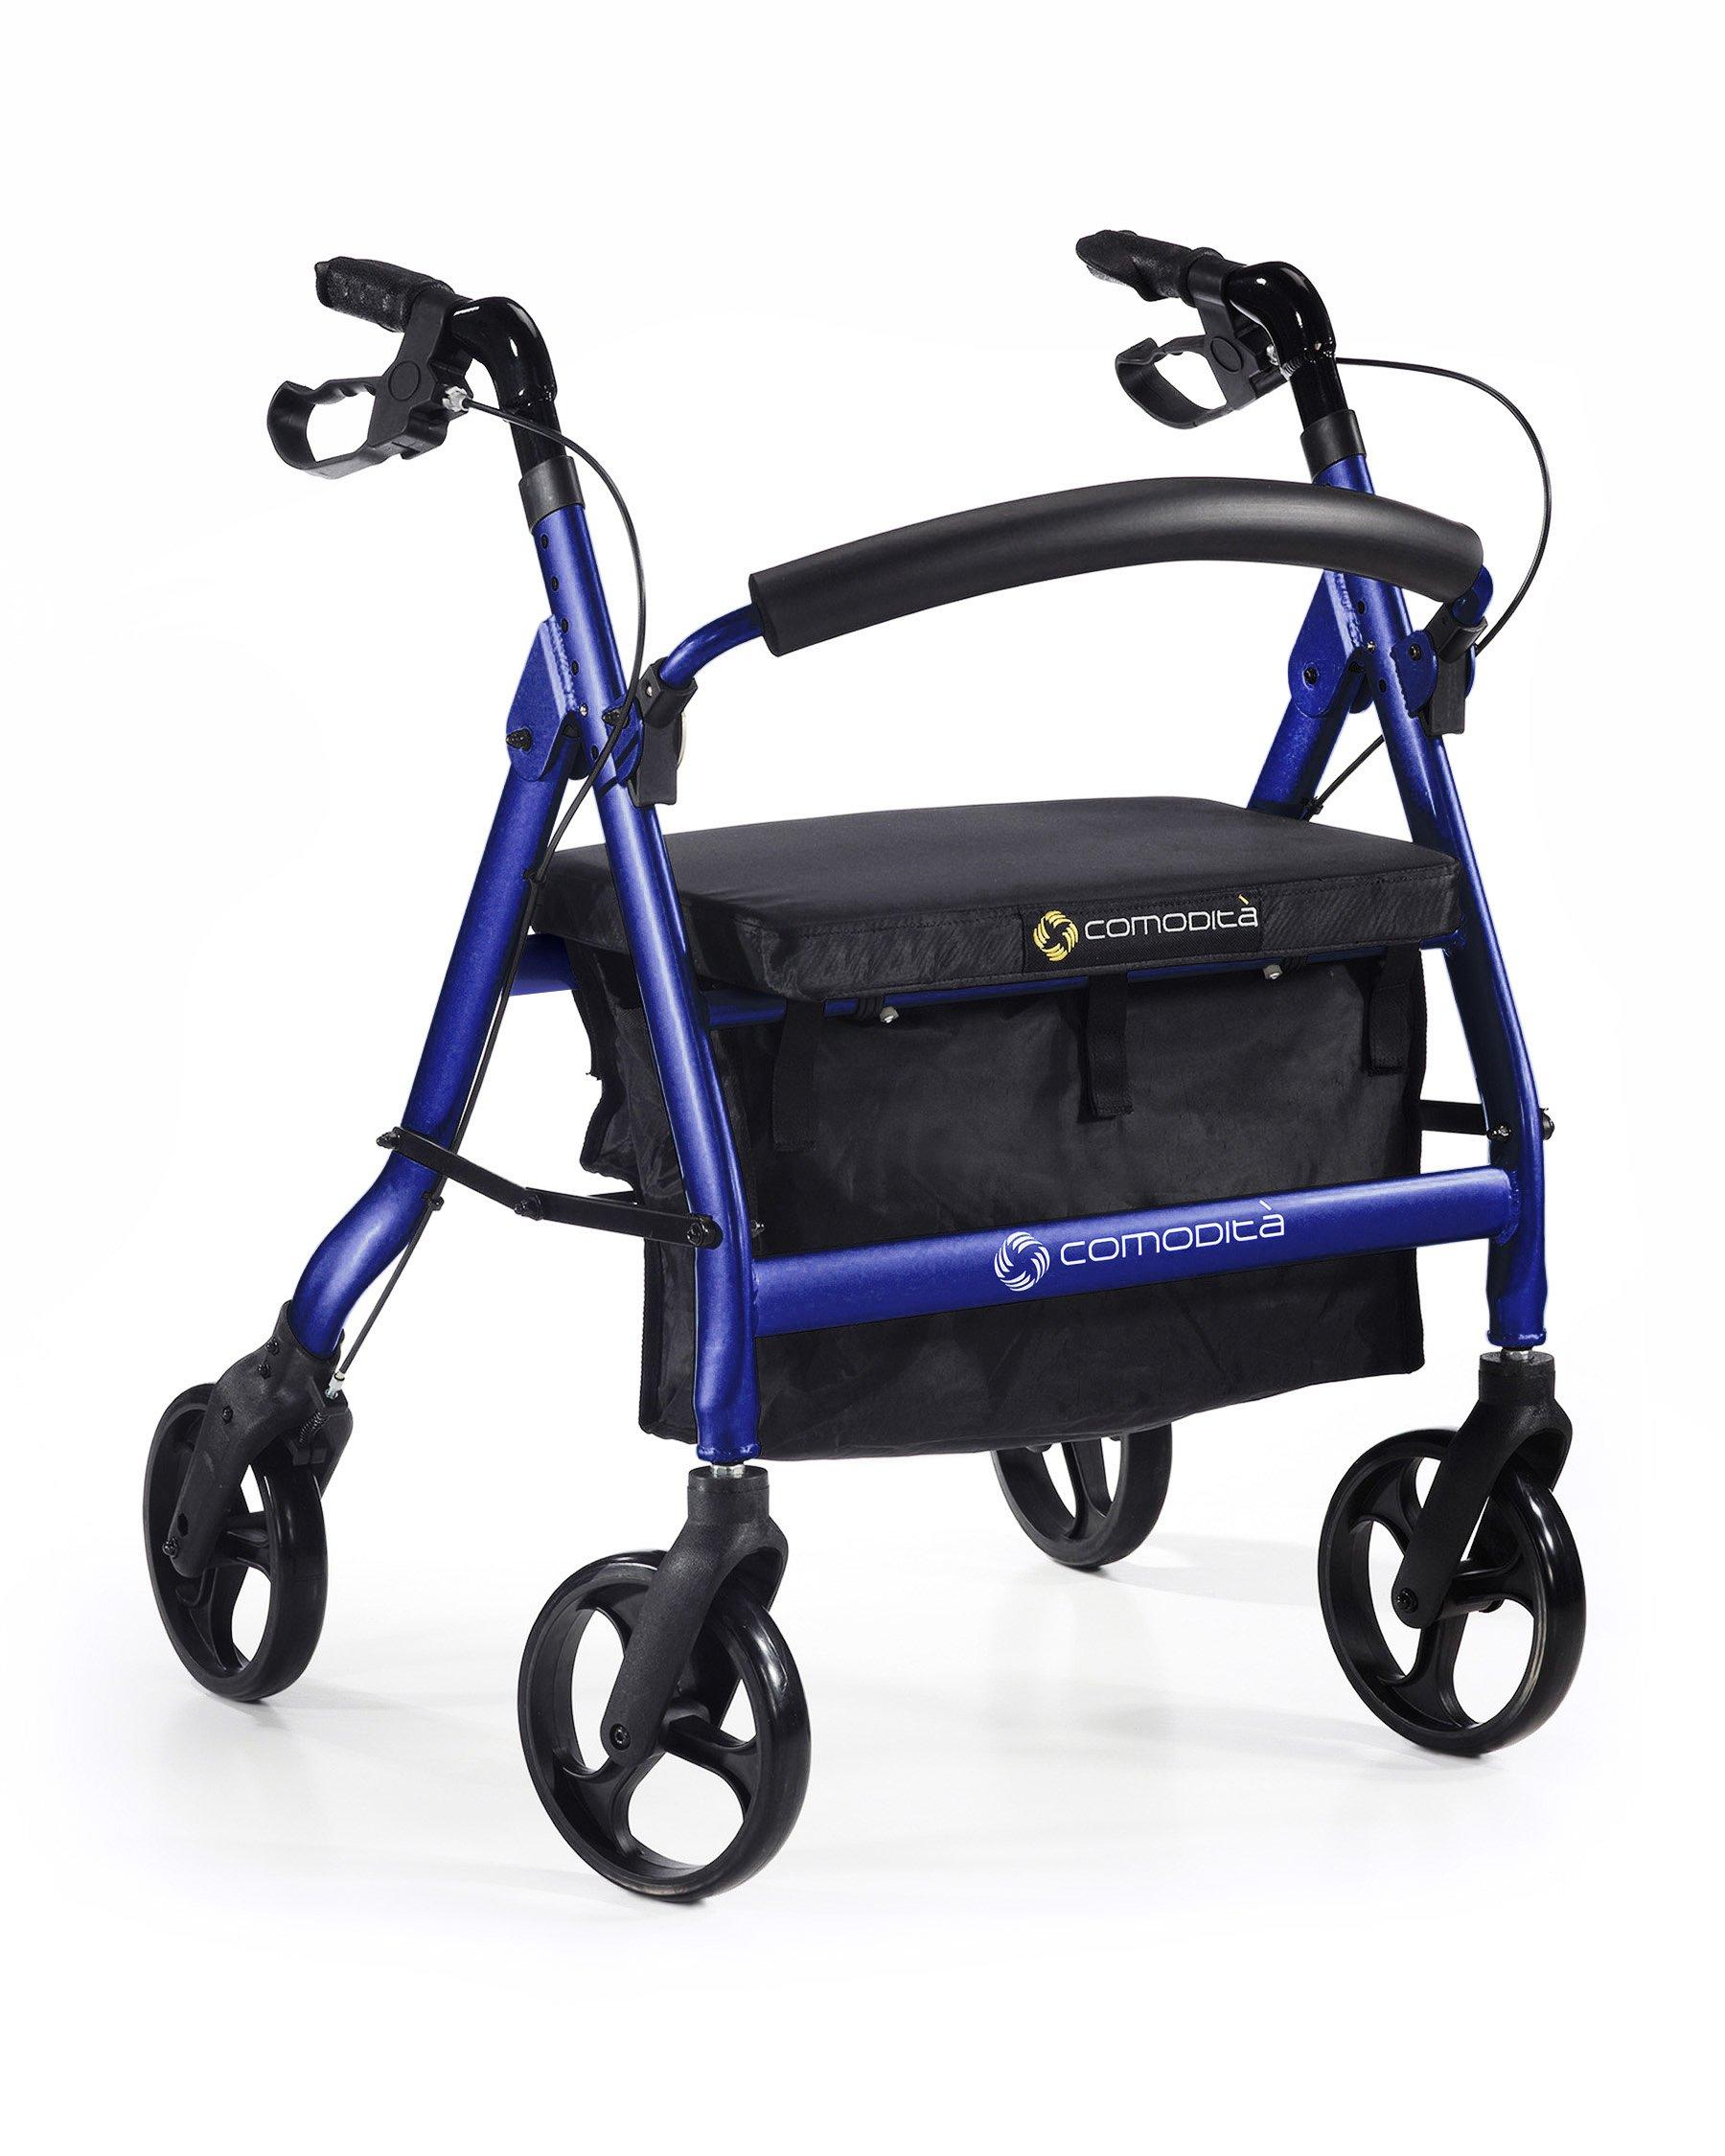 Comodità Spazio Extra Wide Heavy-Duty Rolling Walker - Rollator - with Comfortable 18'' Wide Nylon Seat (Metallic Blue)